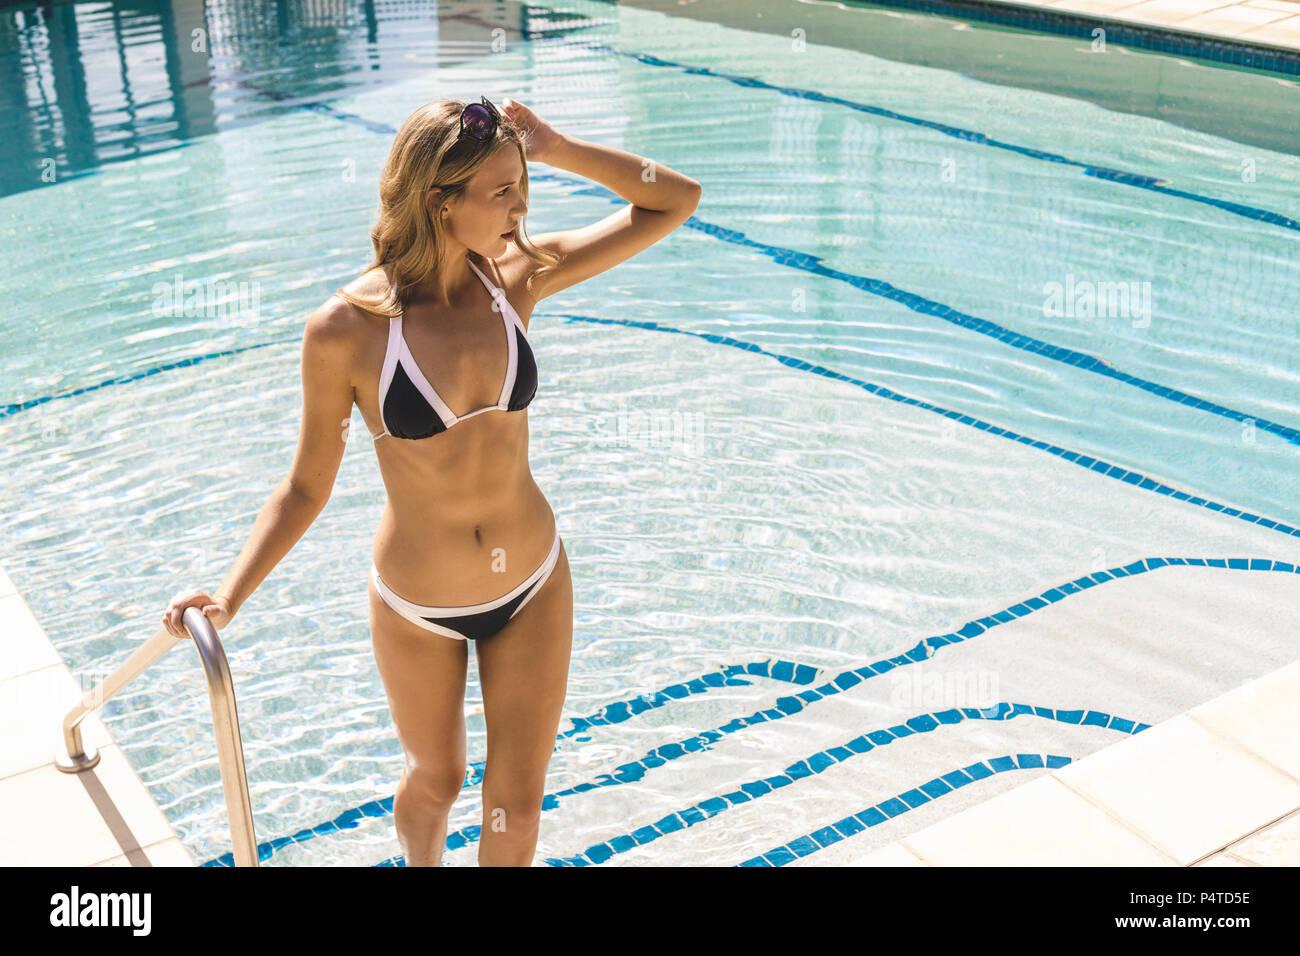 a4236fcfef8c Bikini Girl Standing Wearing Sunglasses Imágenes De Stock & Bikini ...